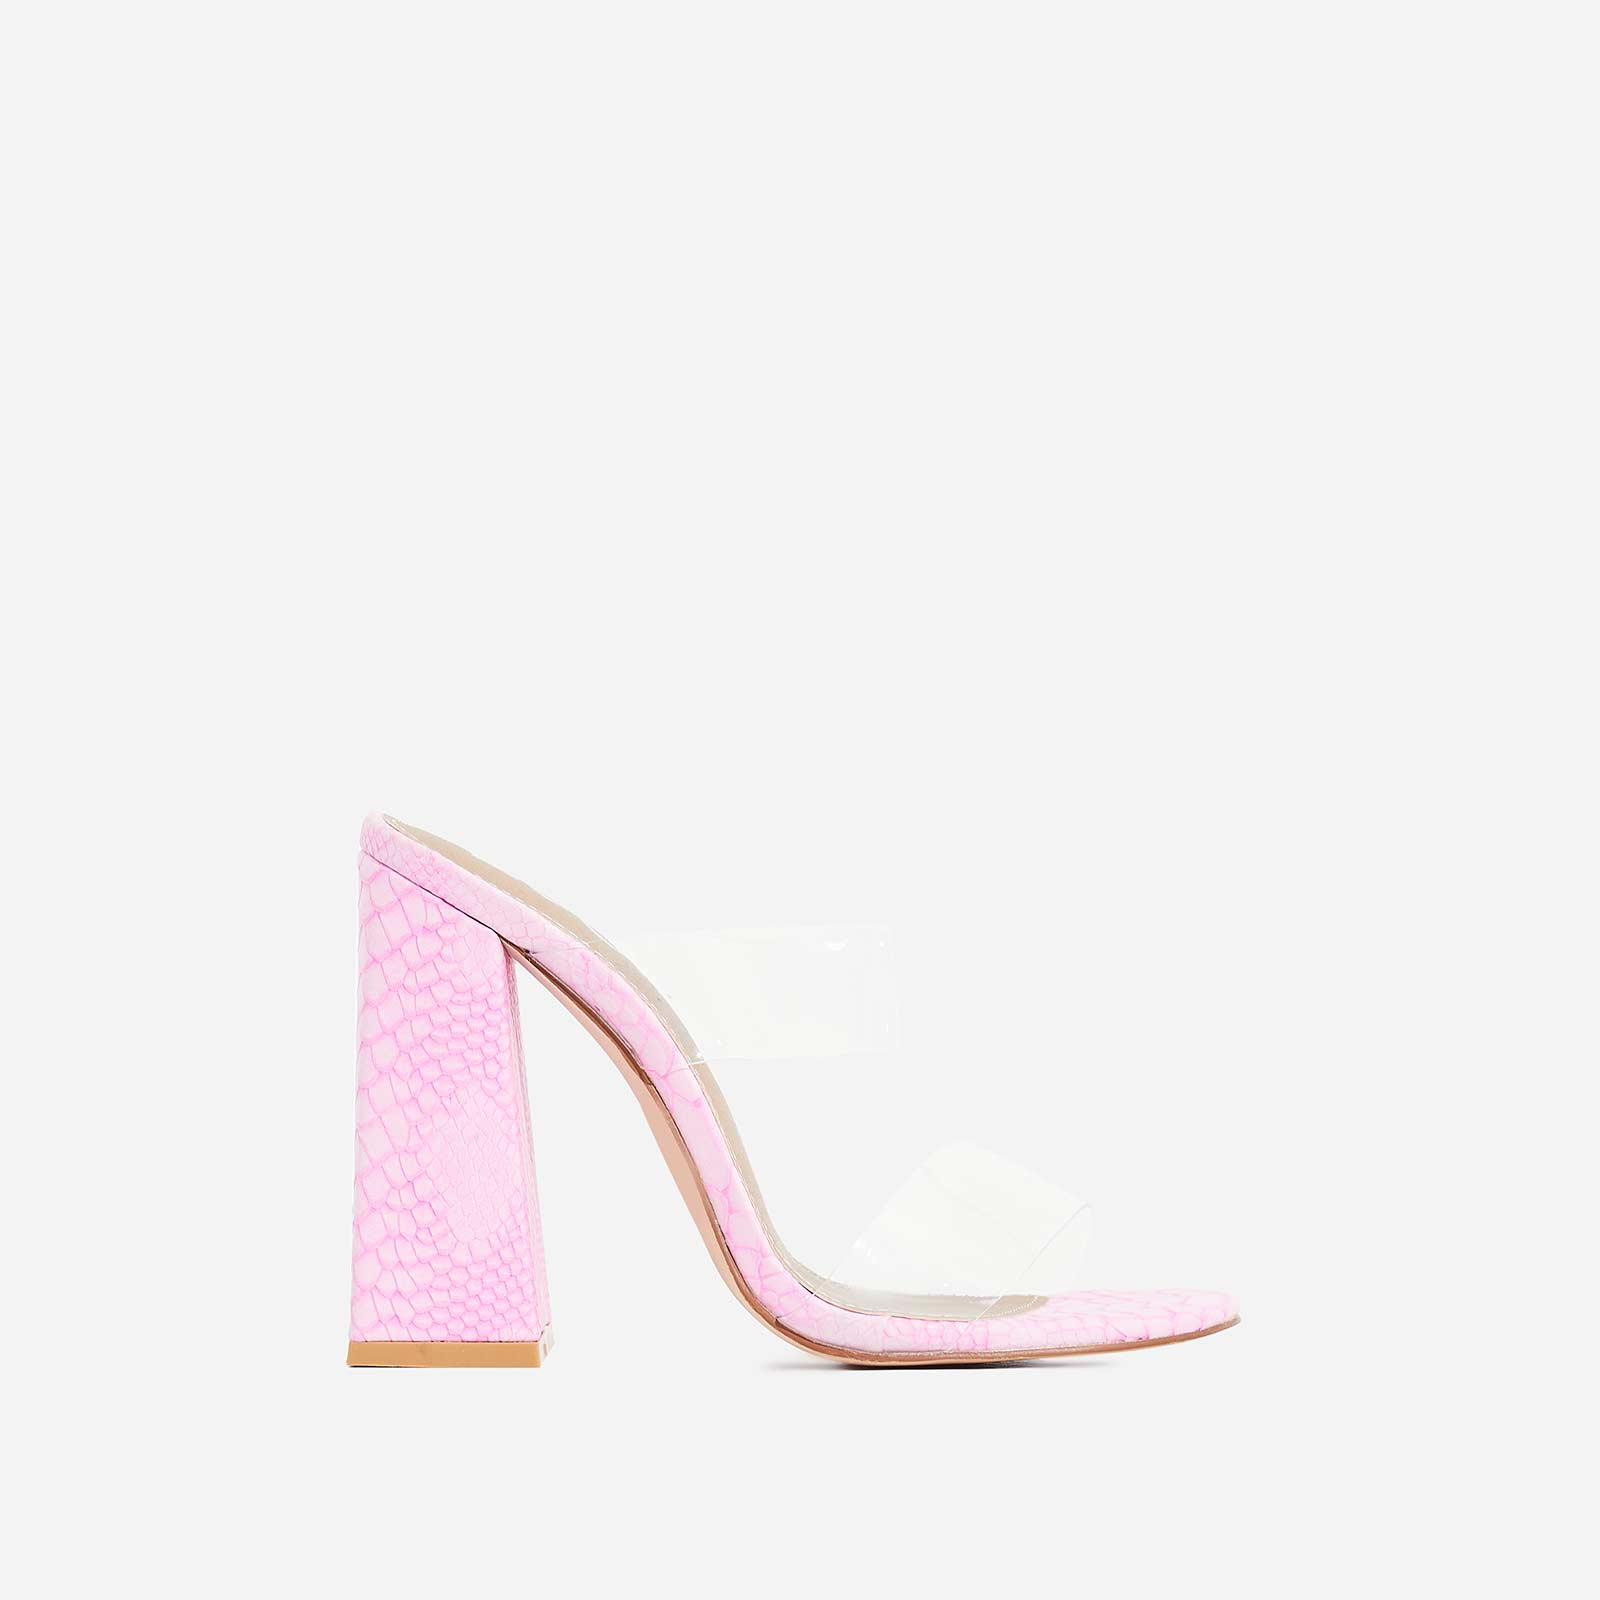 Hester Flared Block Heel Perspex Mule In Pink Snake Print Faux Leather